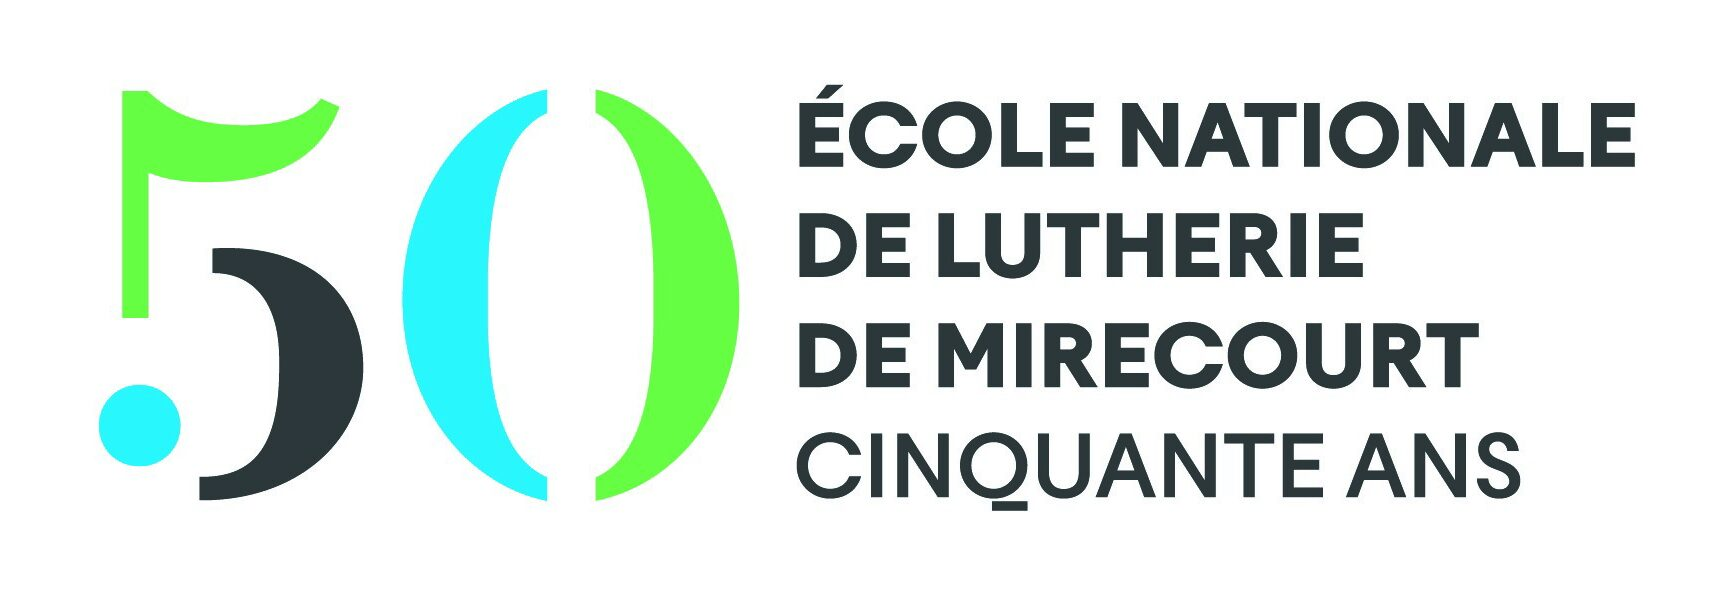 logo2 50 ans.jpg